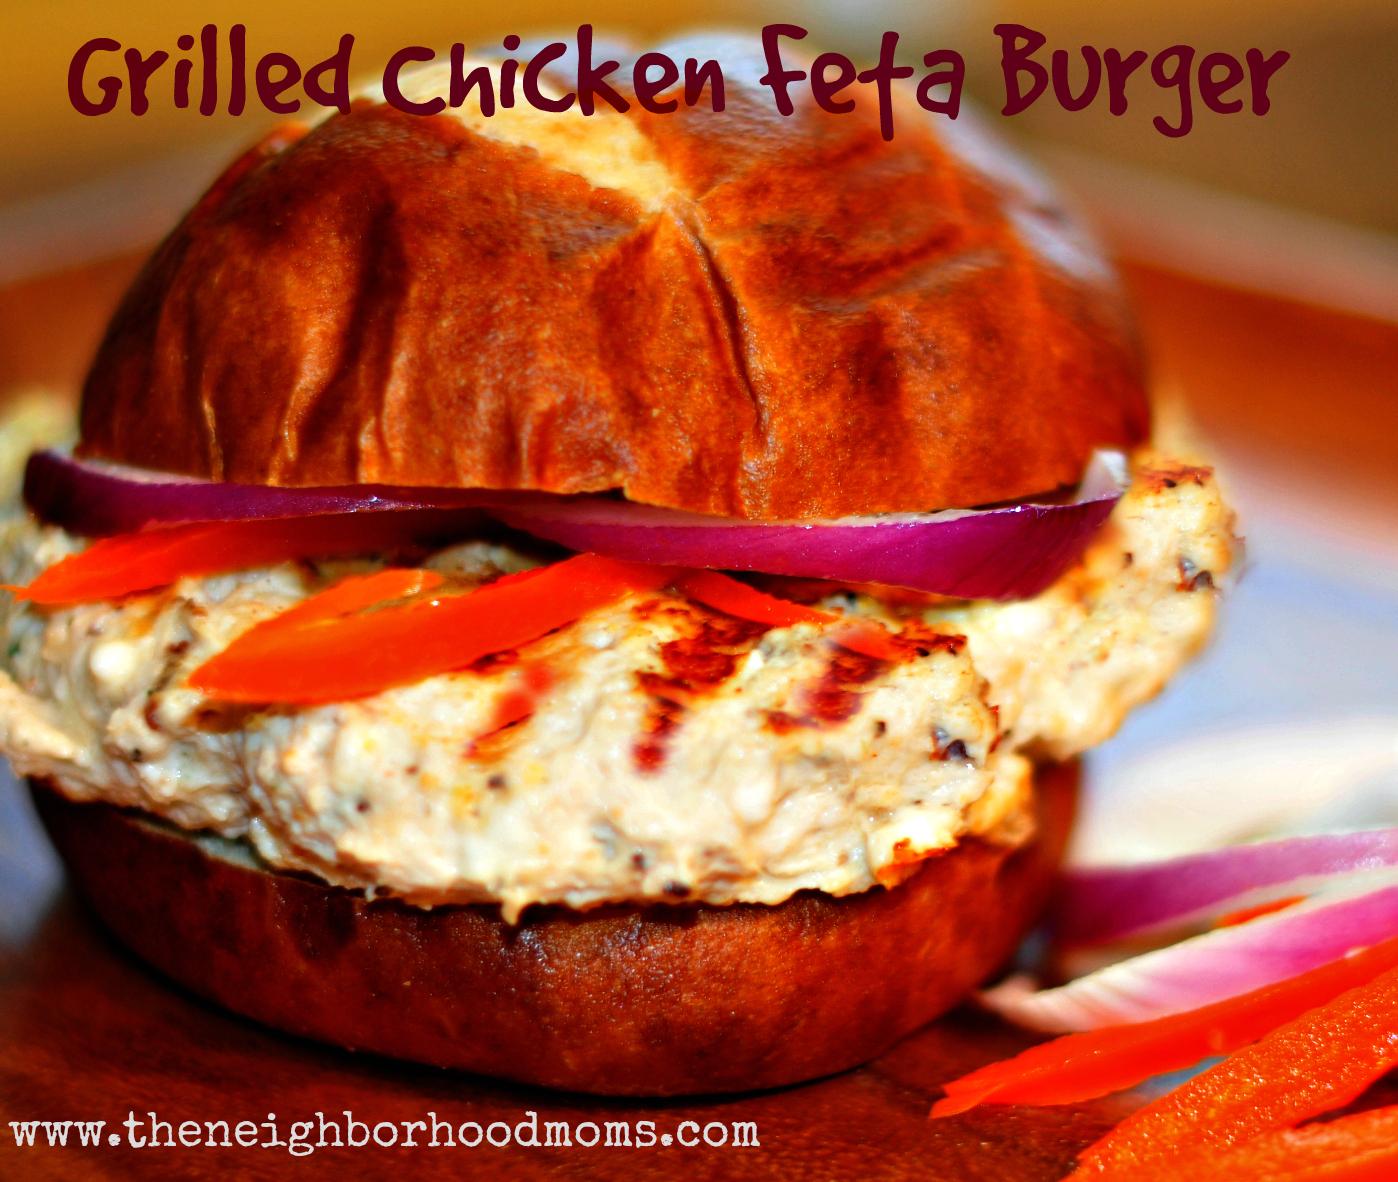 Grilled Greek Chicken Feta Burger - The Neighborhood Moms